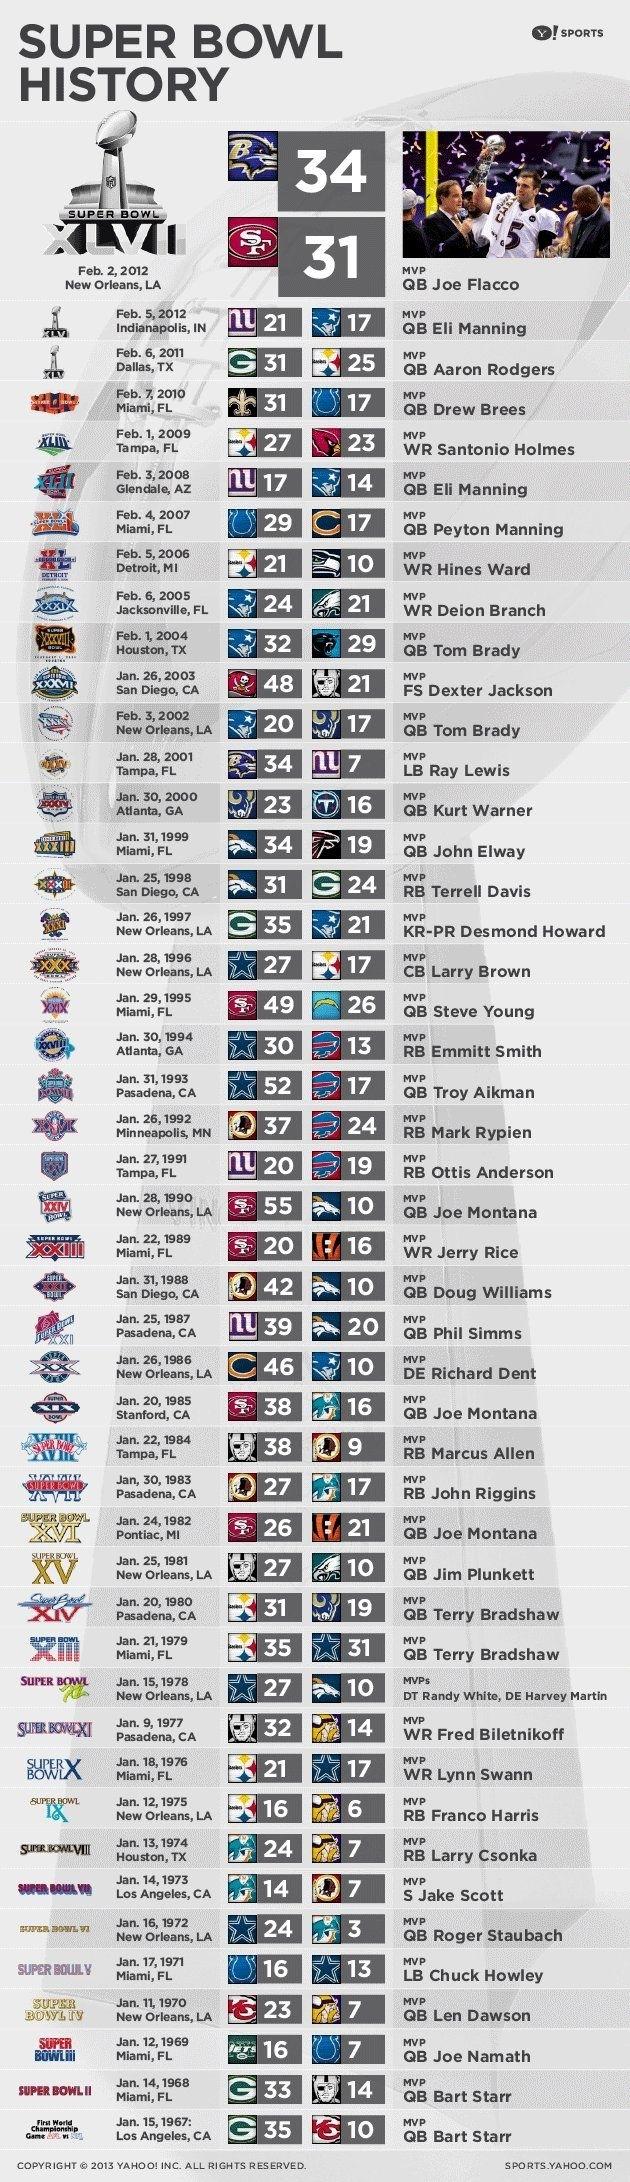 Super Bowl History | Things I Like | Nfl Super Bowl History throughout Last 10 Super Bowls